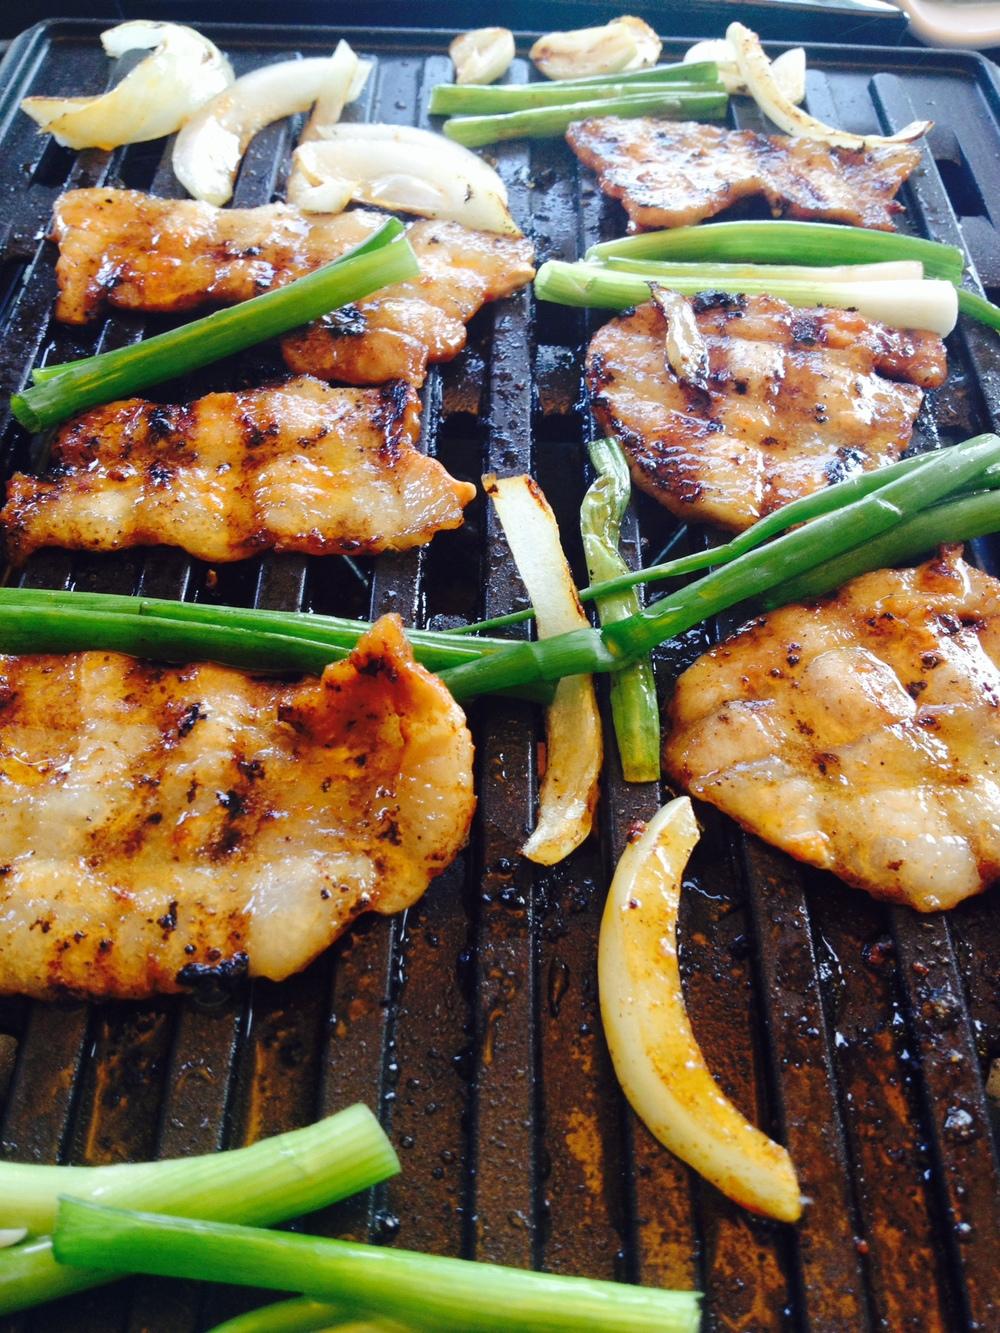 grill porkbelly1.JPG